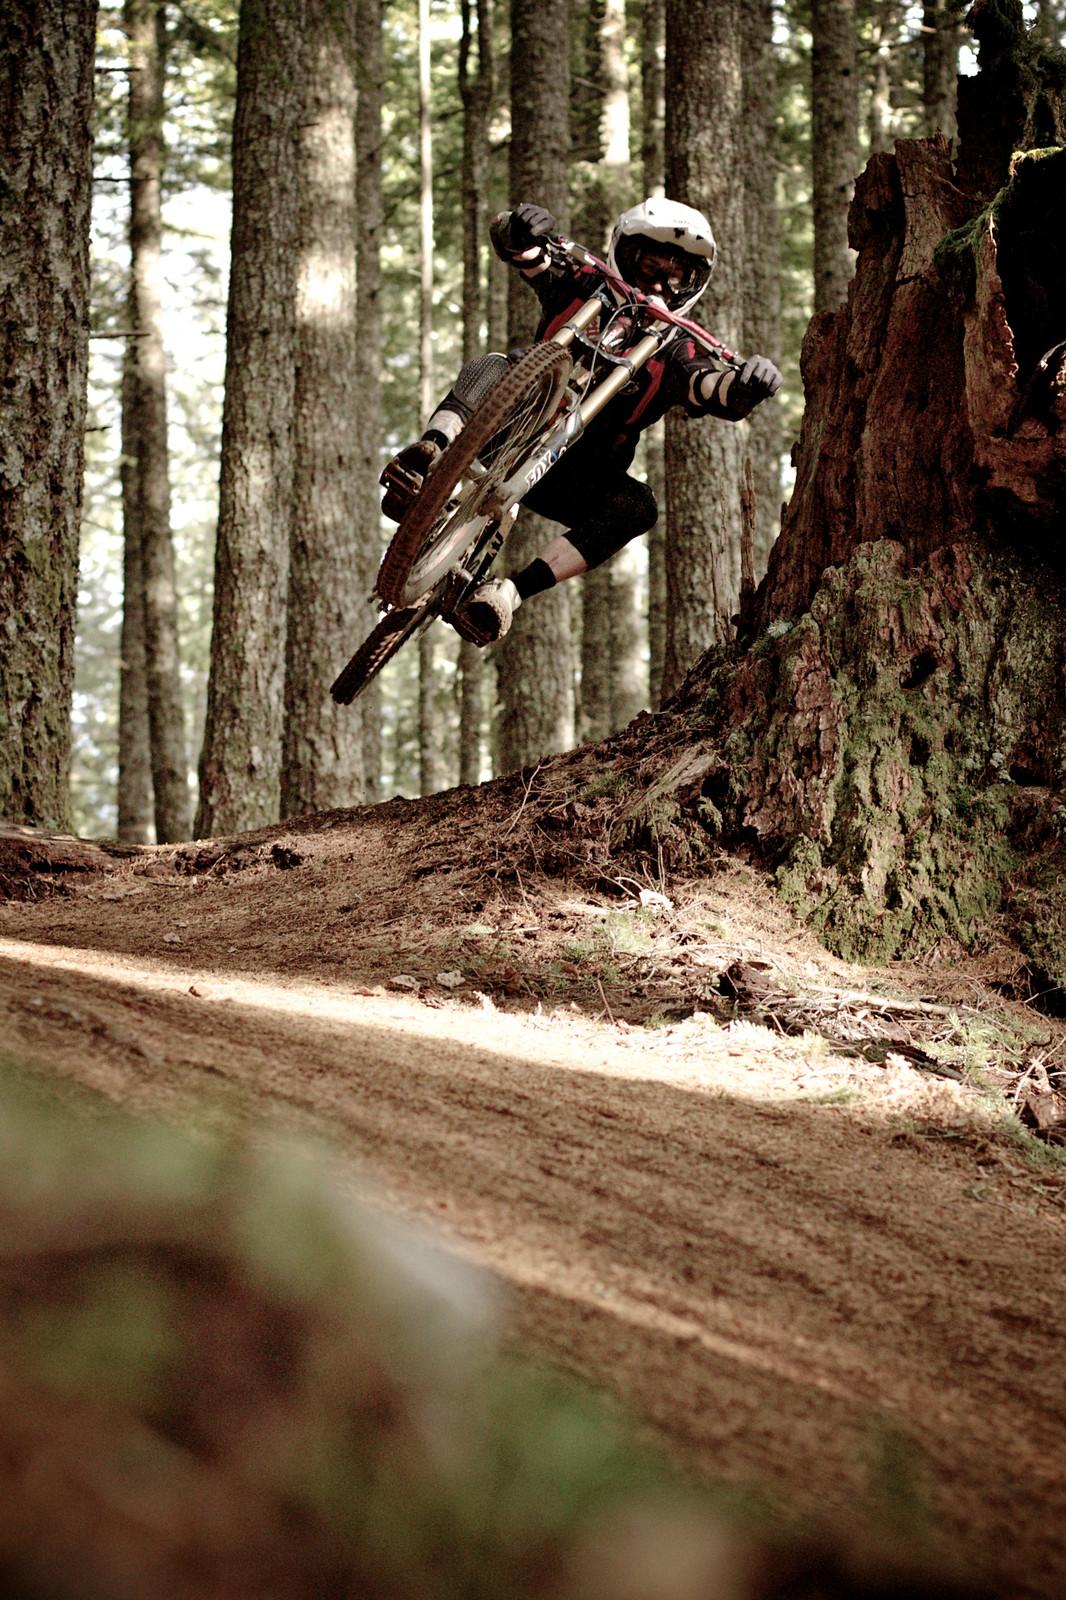 Backseat Bobby Stenson - corytepper.com - Mountain Biking Pictures - Vital MTB